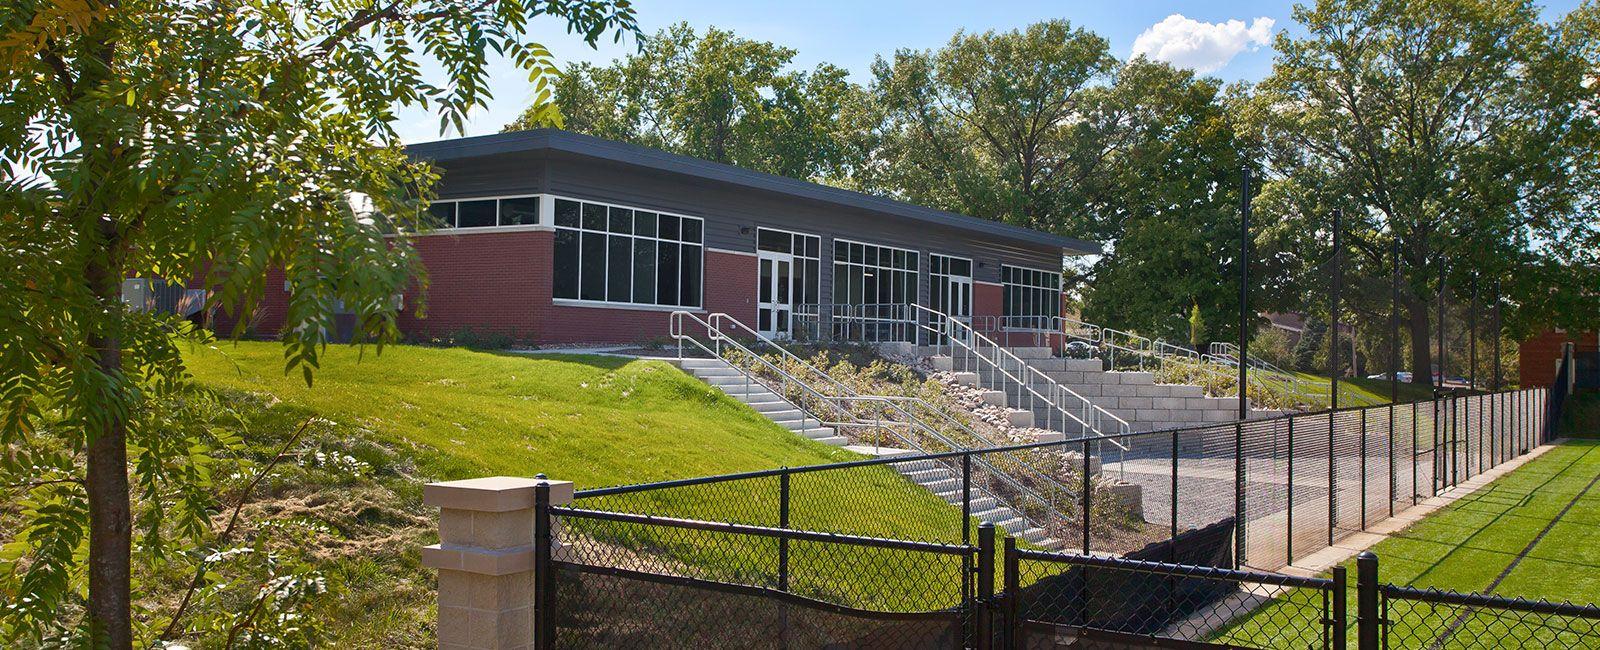 St. Ambrose Locker Facility New